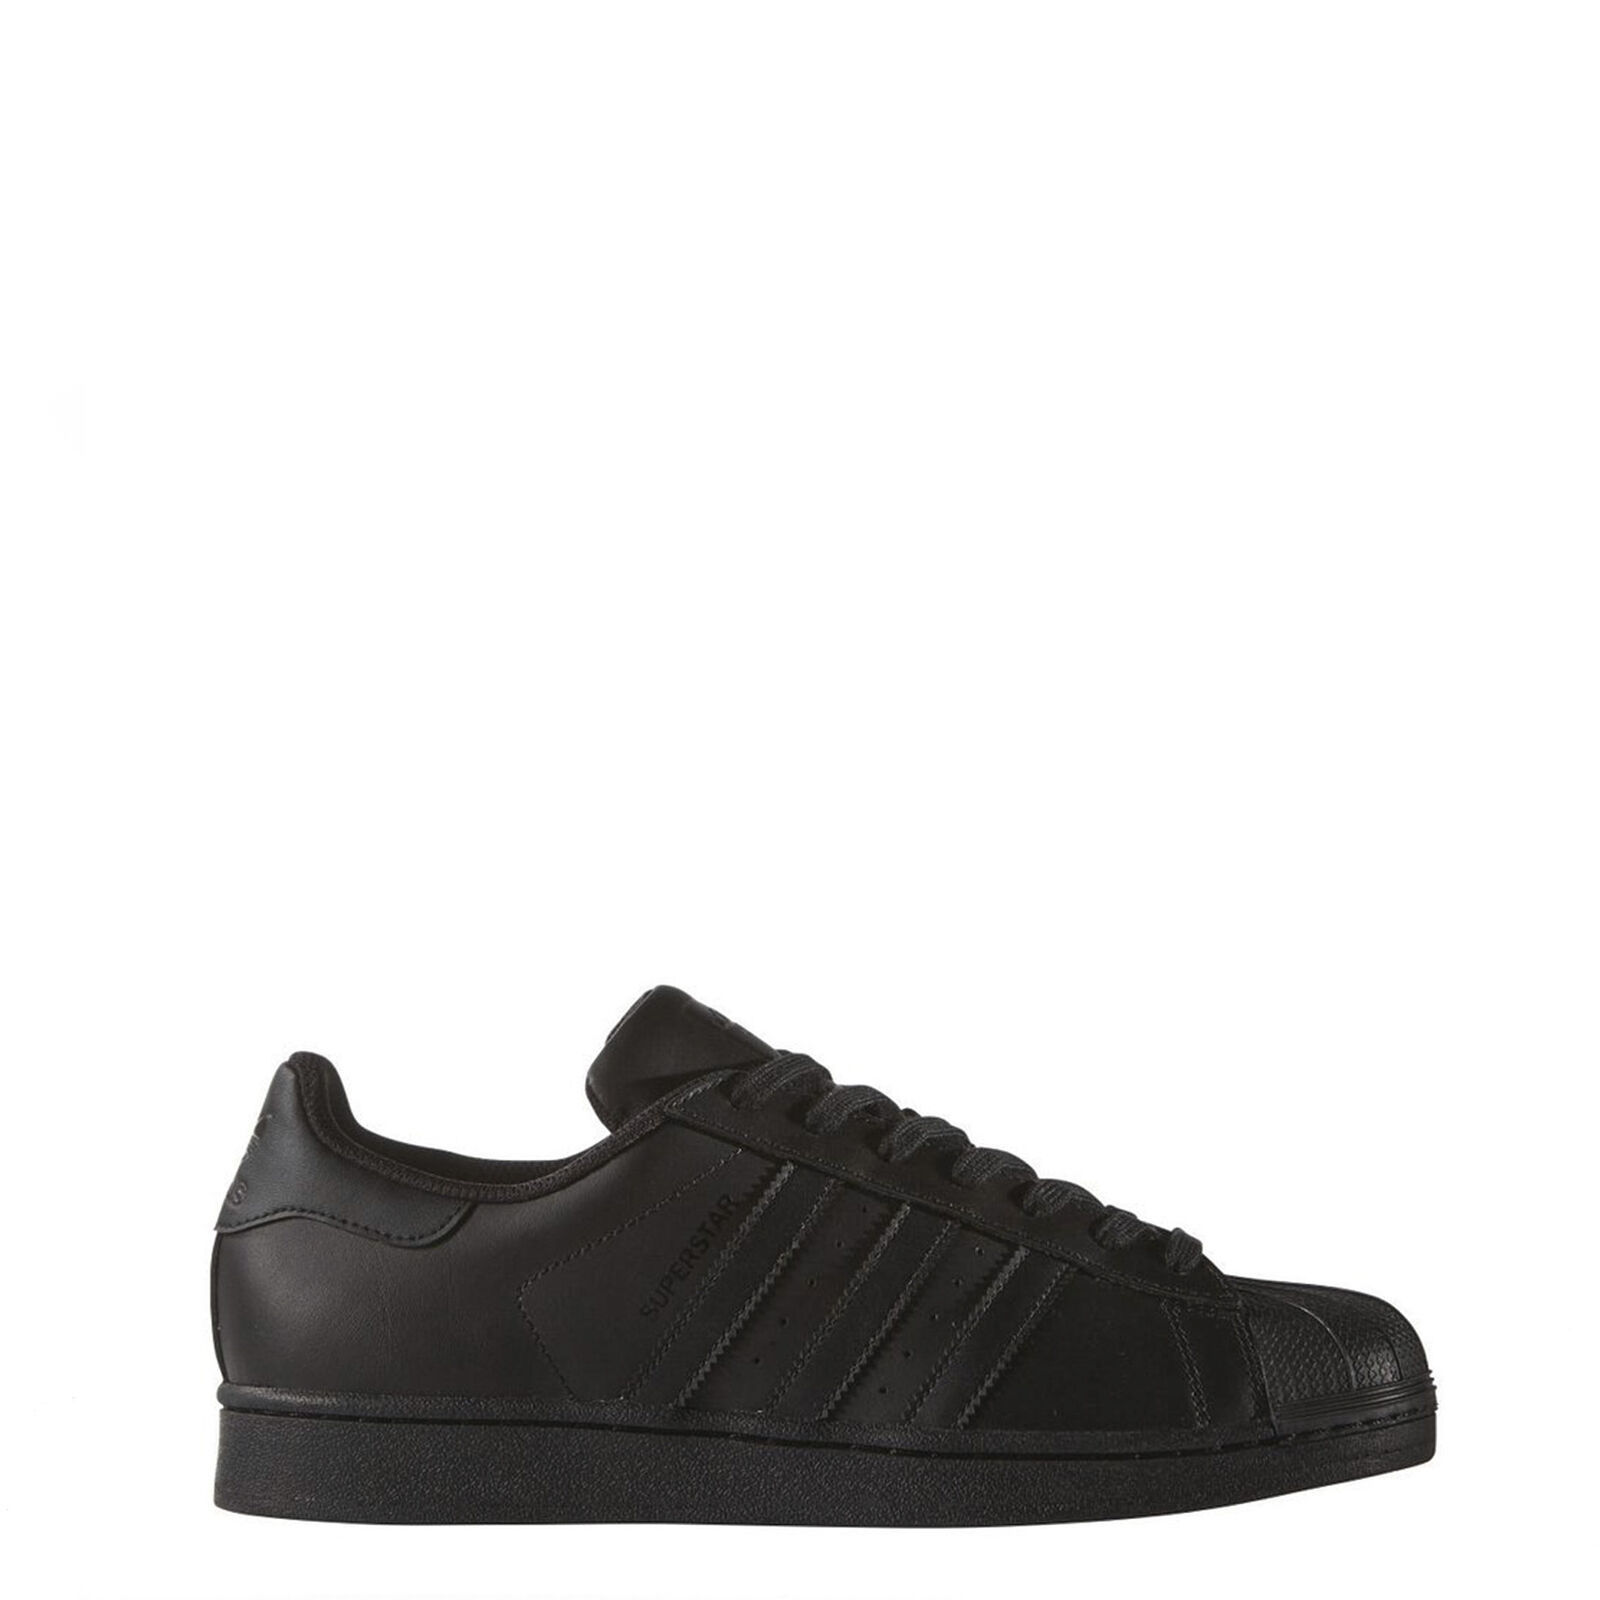 Scarpe Adidas taglie Uomo/Donna Superstar, Sneakers Nero Total Black o Bia-Rosso